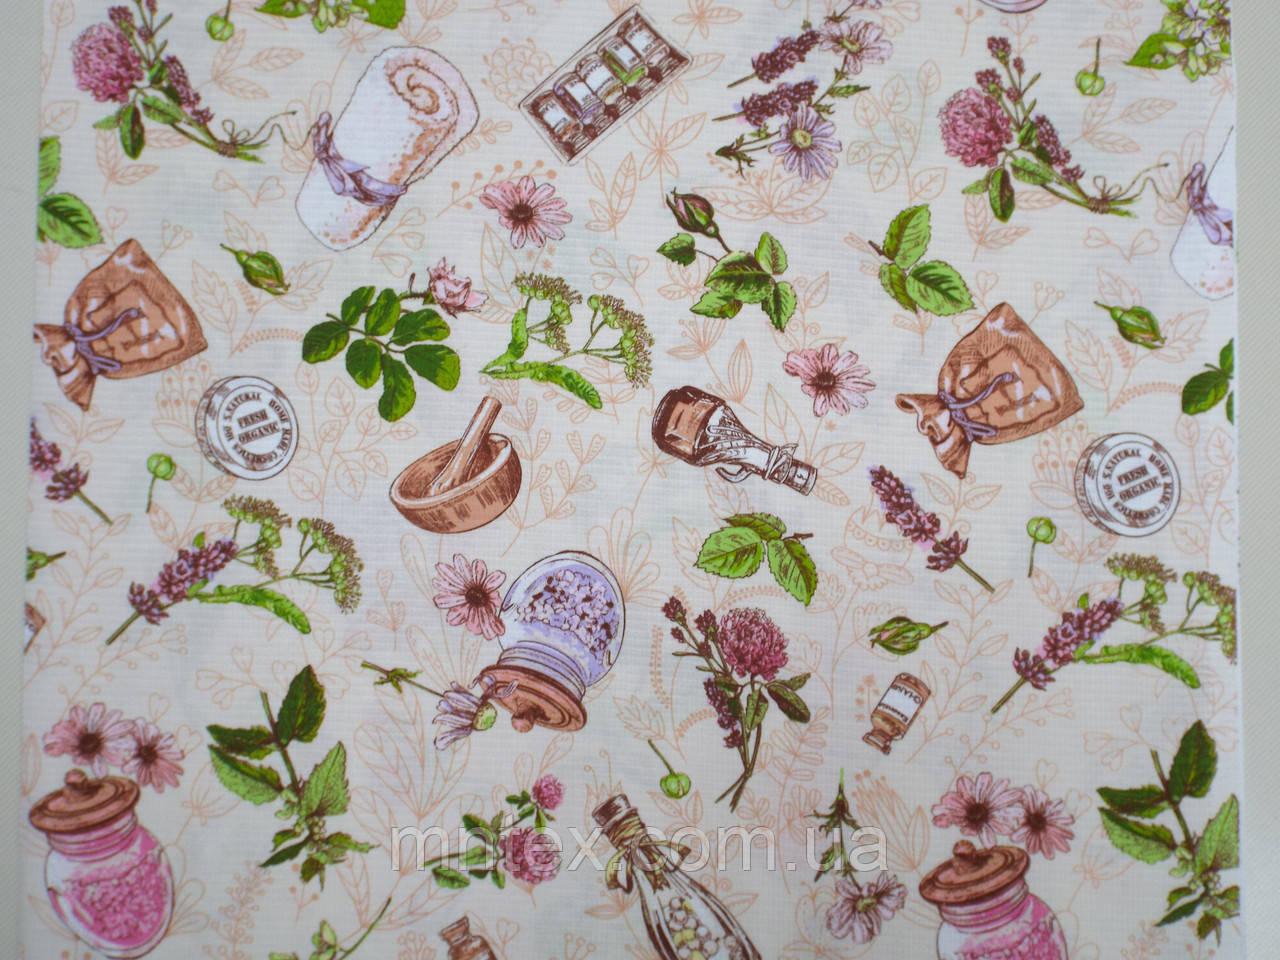 Ткань Вафельная Ширина 150 см. Французский Мотив